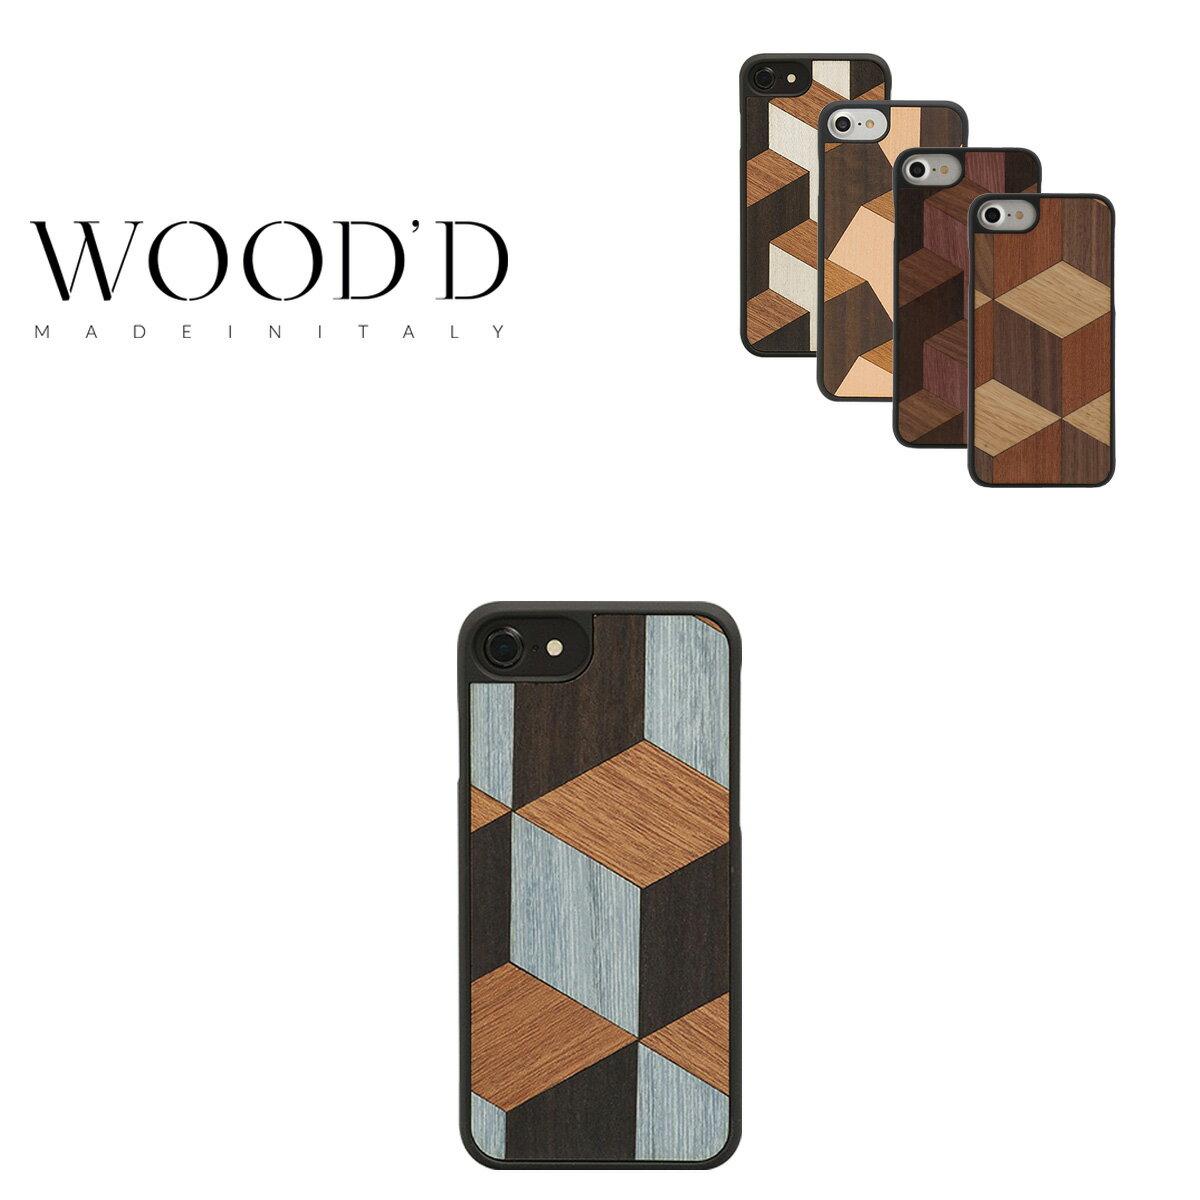 Wood'd iPhone8 iPhone7 iPhone6 ケース レディース メンズ 木製 イタリア製 アイフォン スマホケース スマートフォン カバー ハンドメイド Real wood Snap-on covers GEOMETRIC ウッド 【PO10】【bef】【即日発送】